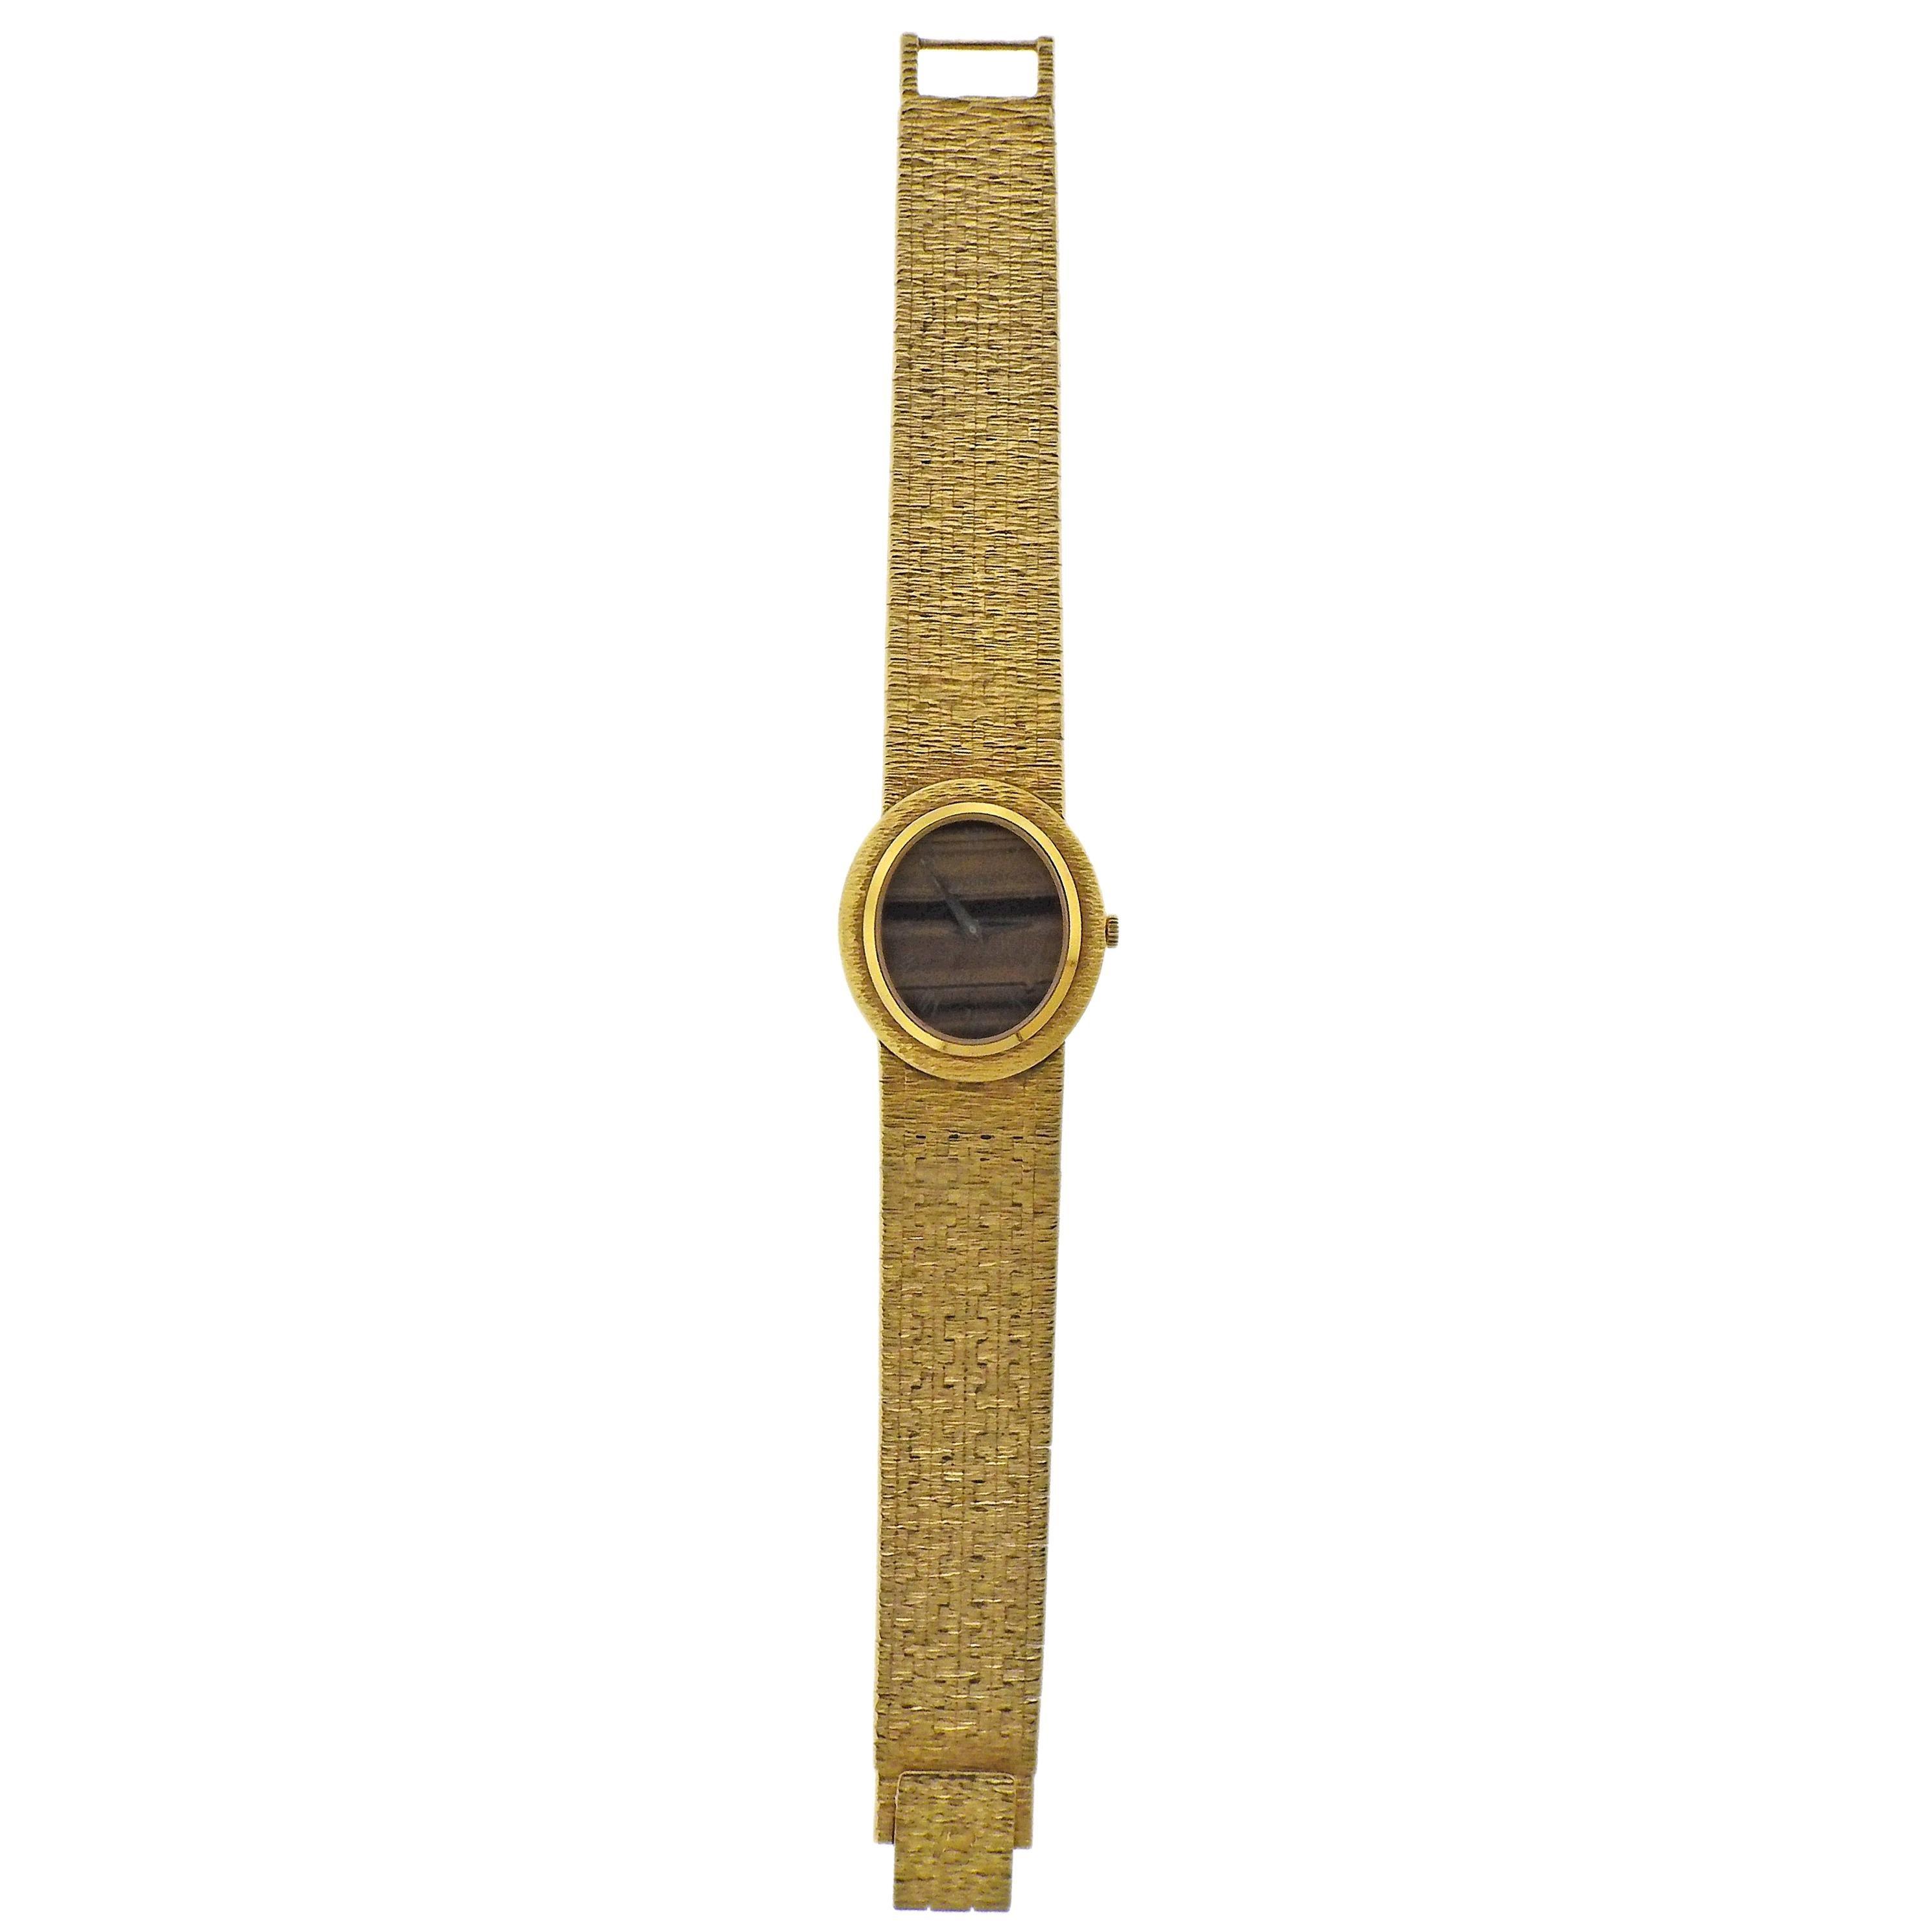 Piaget Tiger's Eye Dial Yellow Gold Classic Wrist Watch